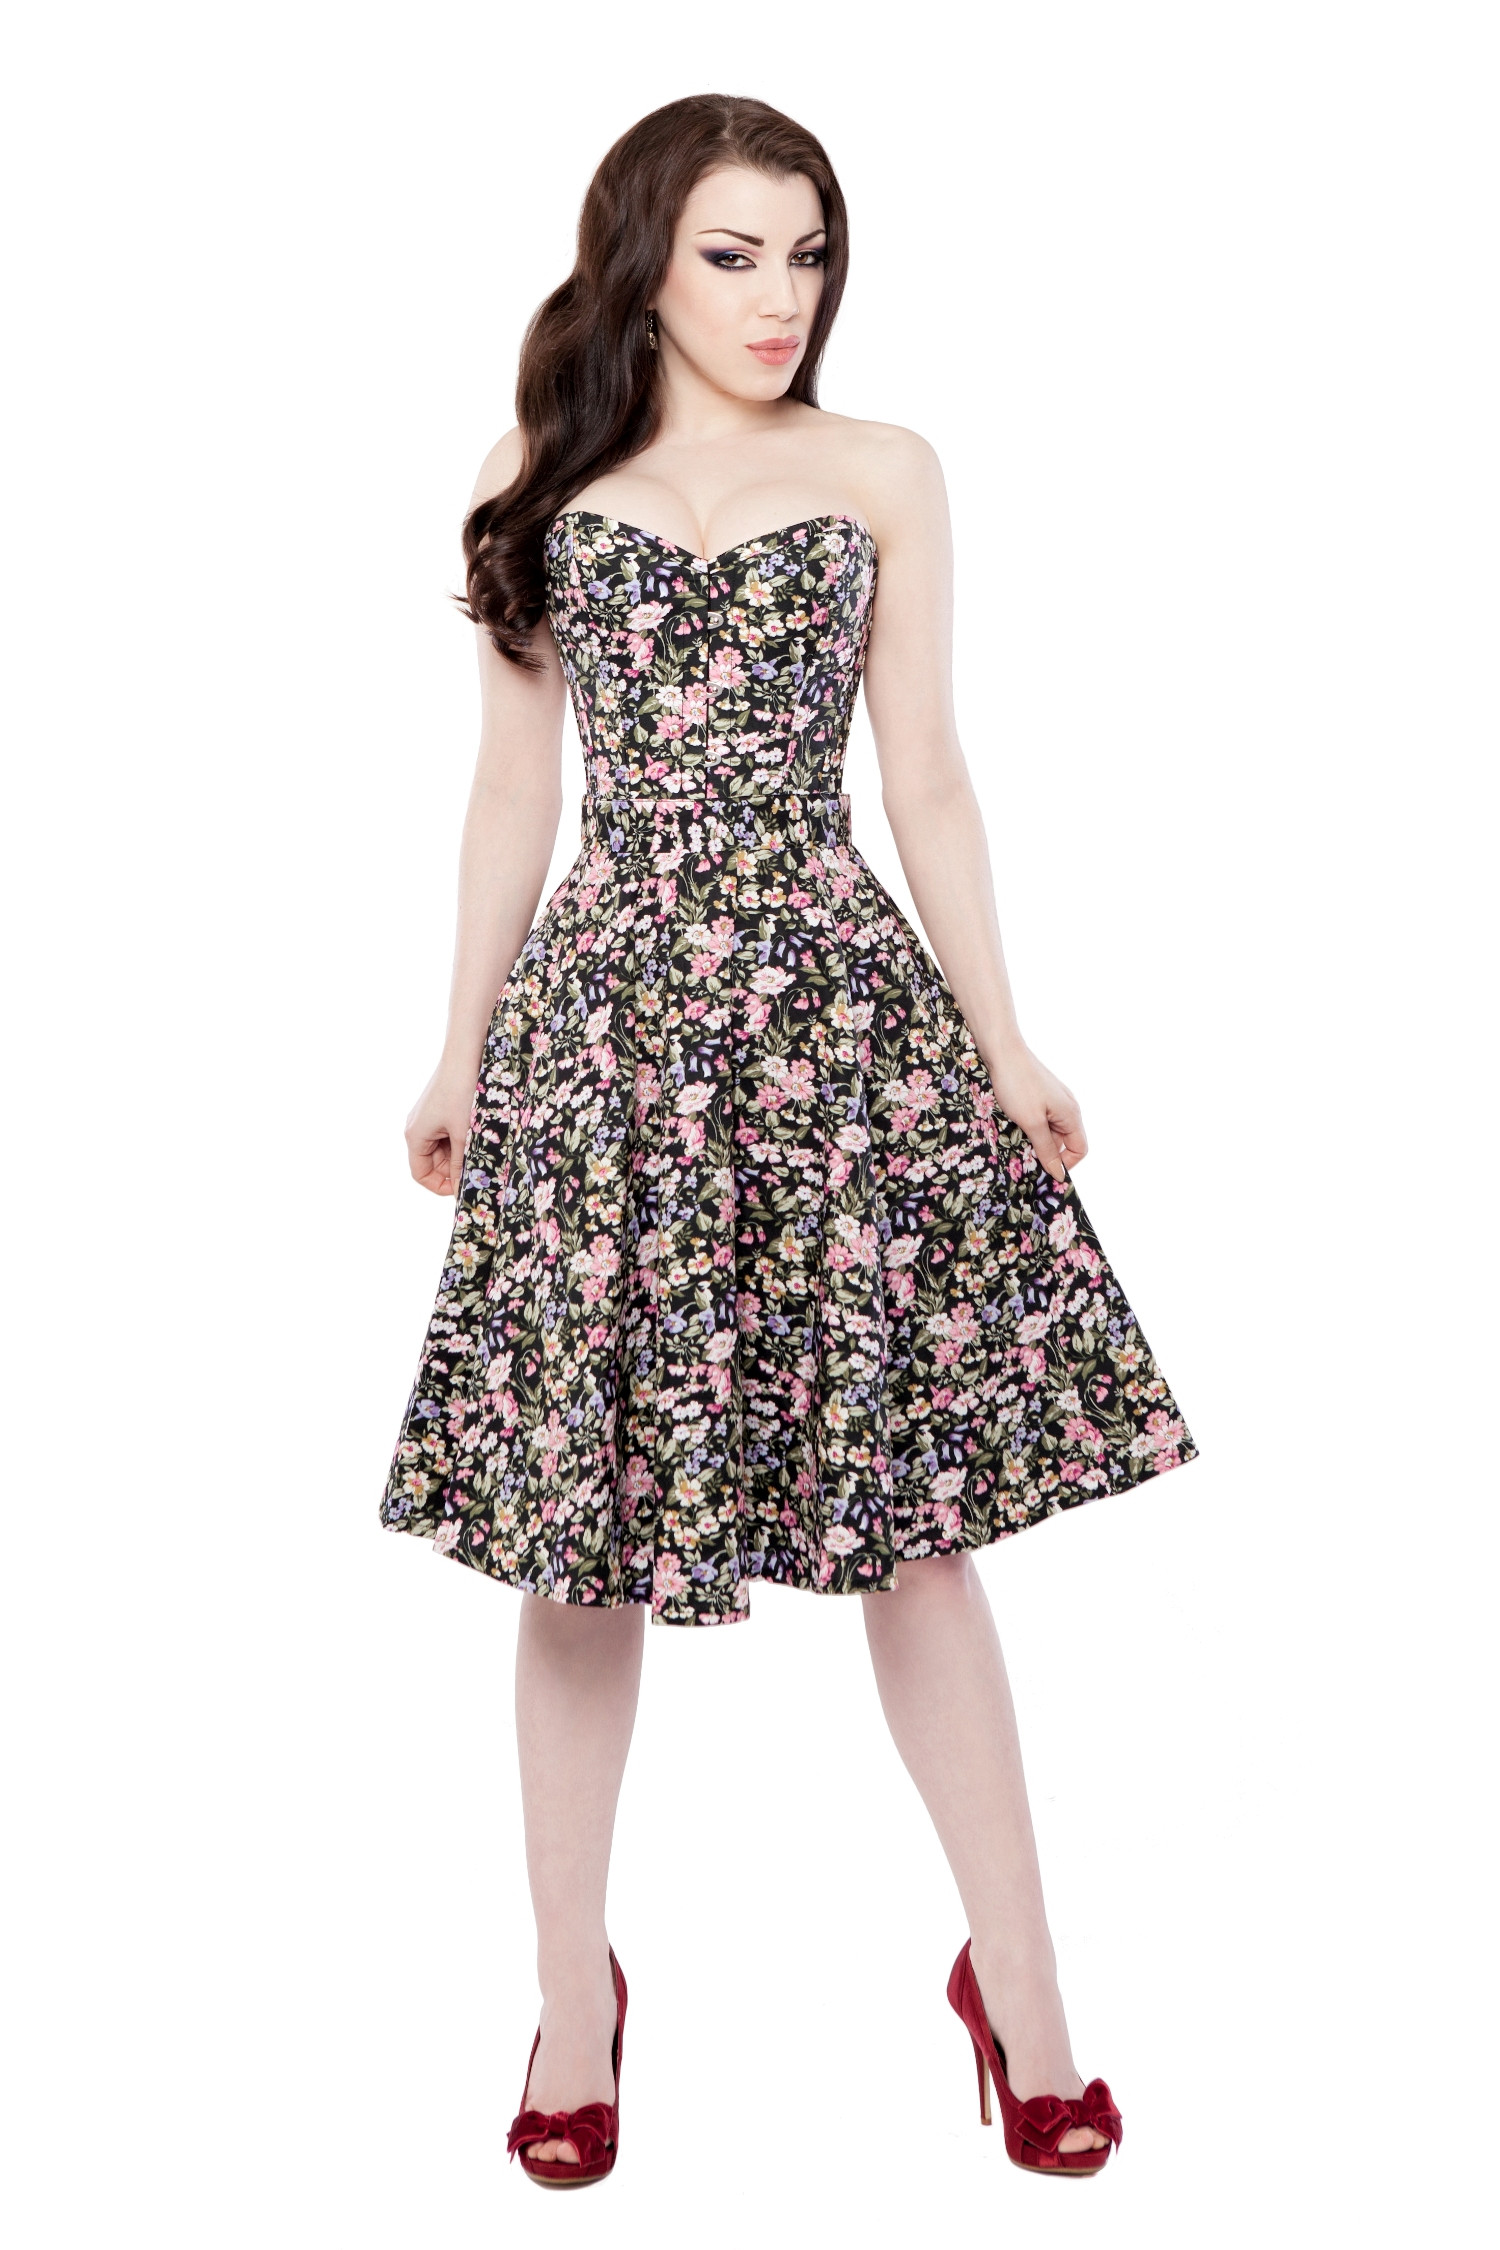 Black Floral Corset Dress With Long Corset